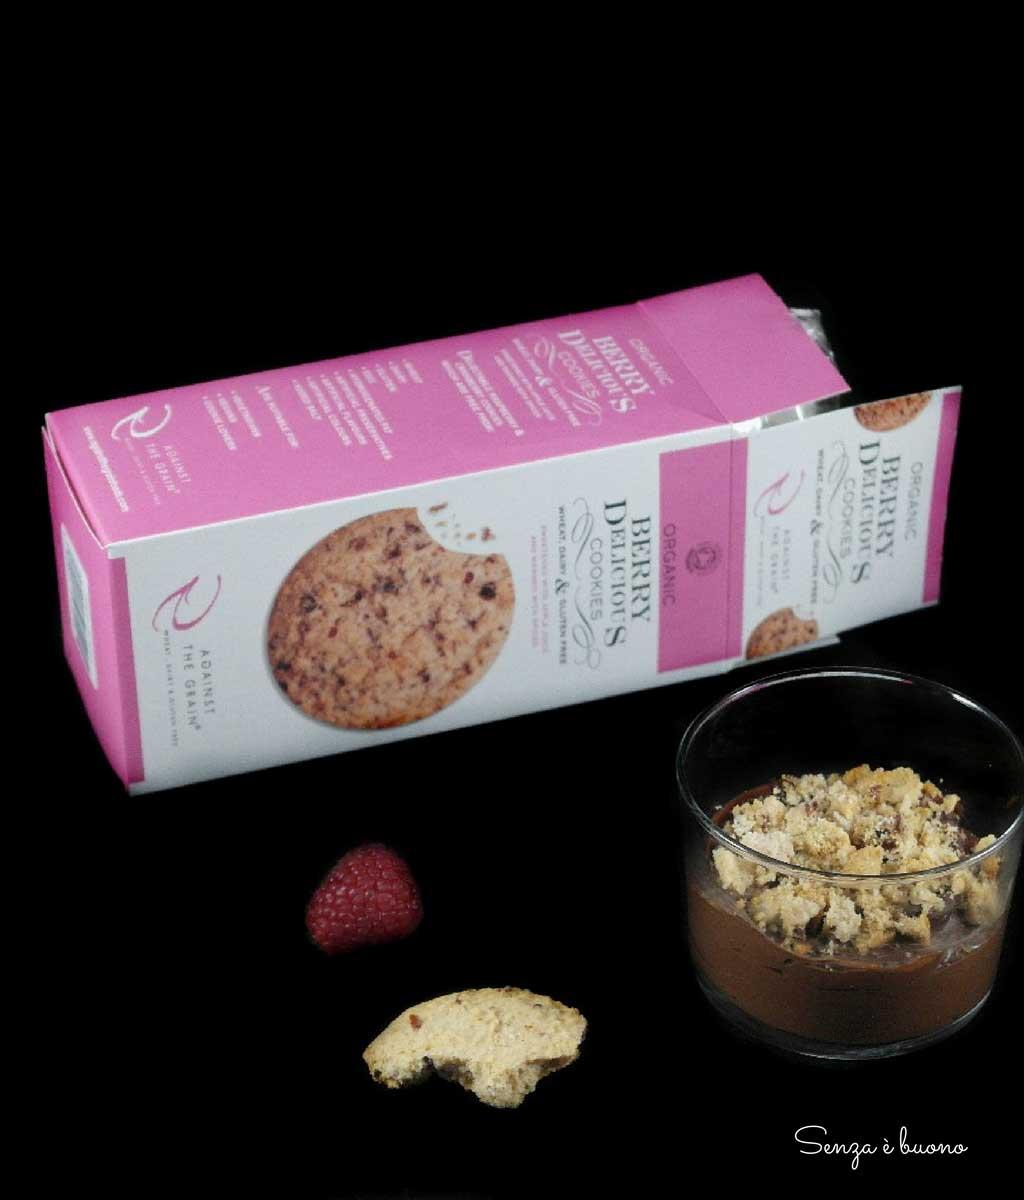 Ricetta mousse al cioccolato vegan senza glutine